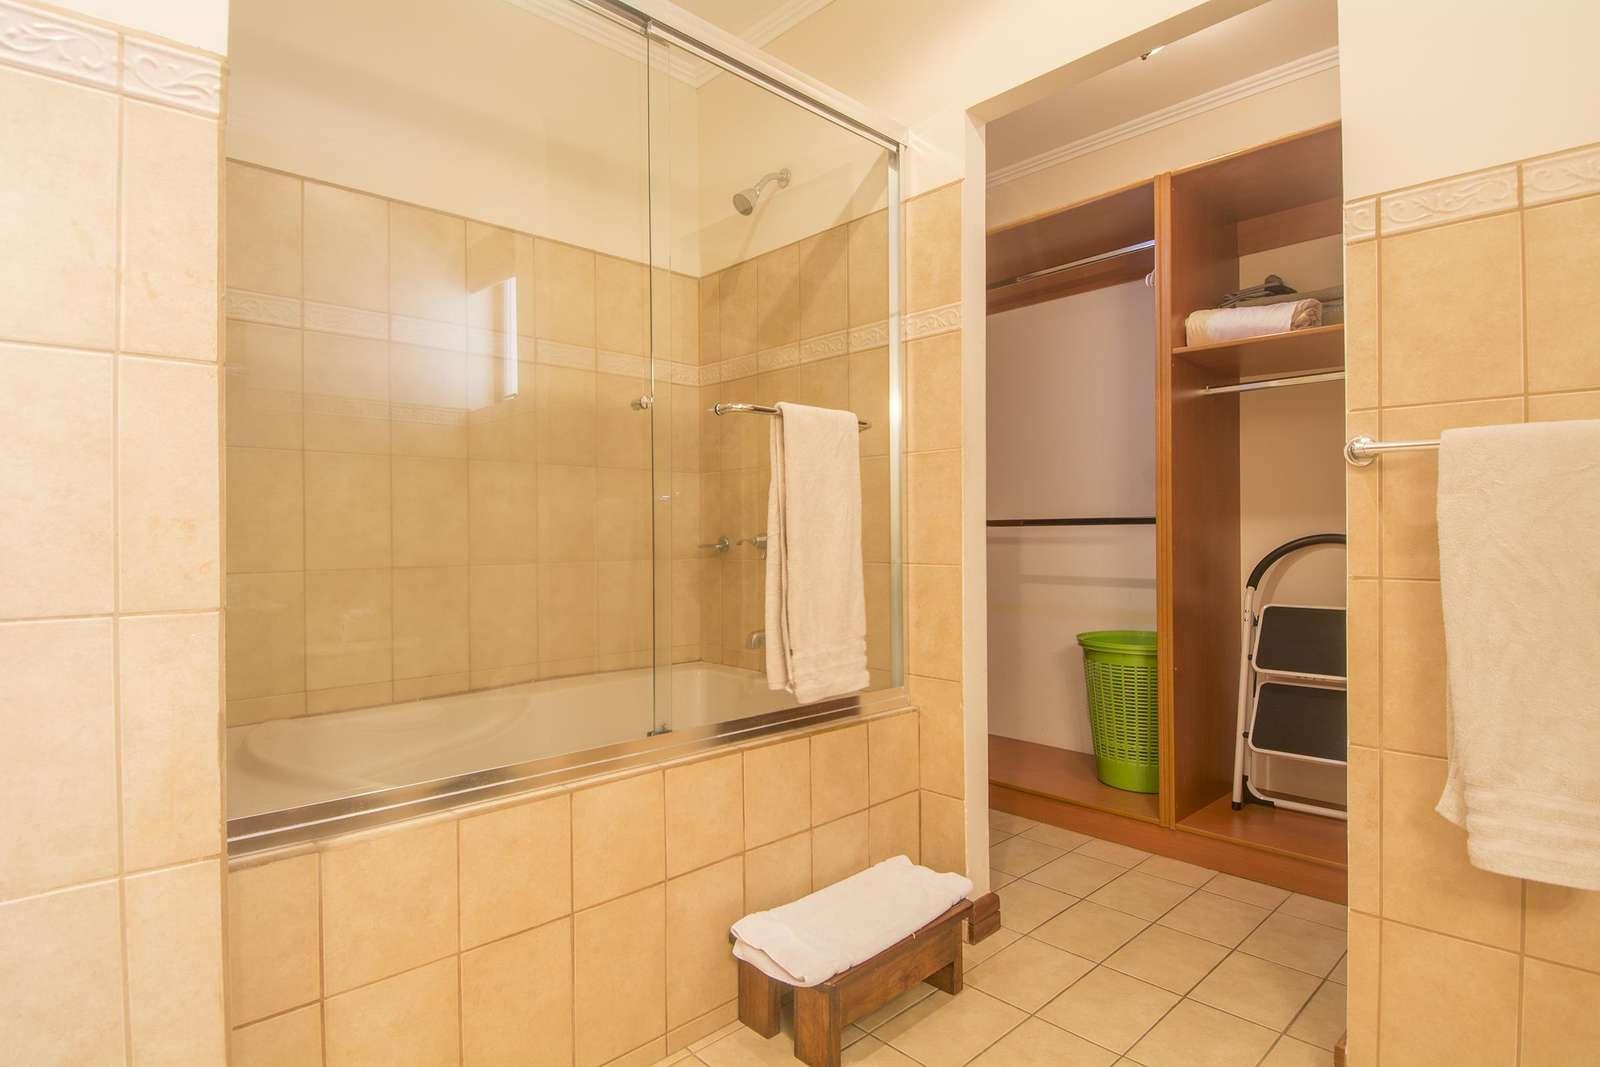 Master bathroom, garden tub